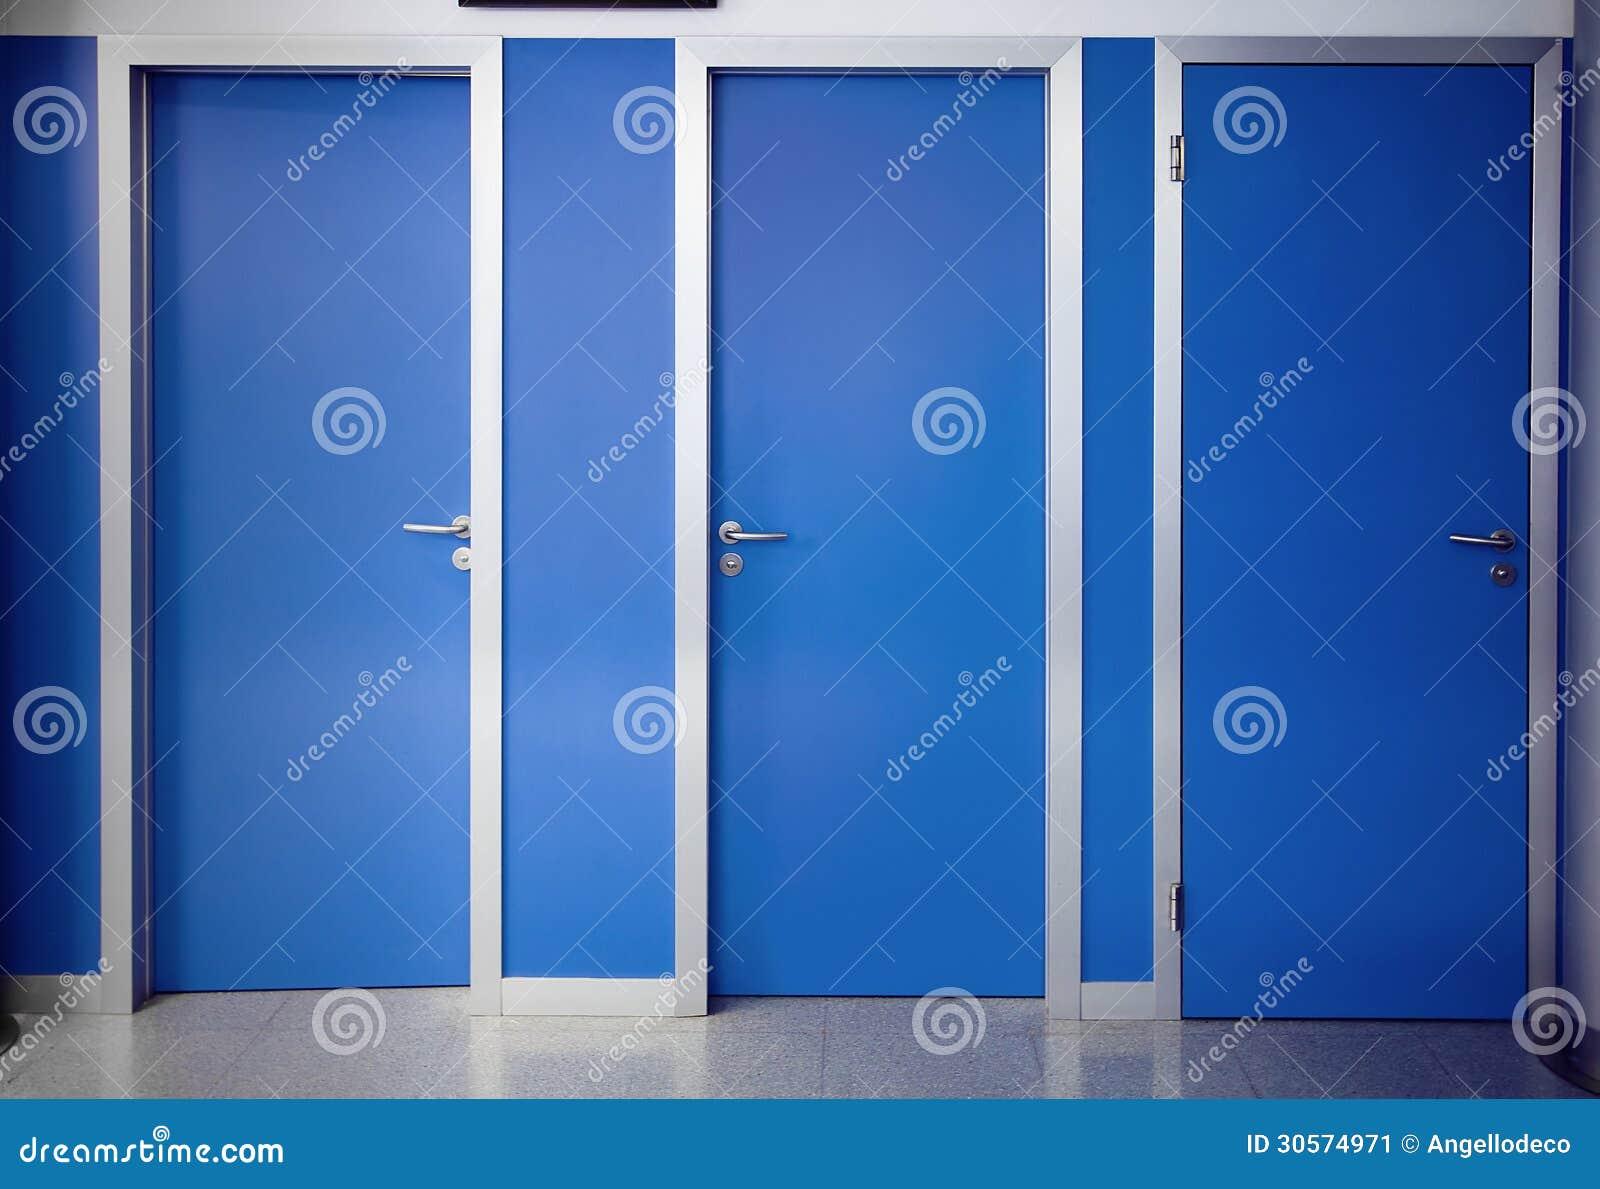 Three Doors Closed Stock Image Image 30574971